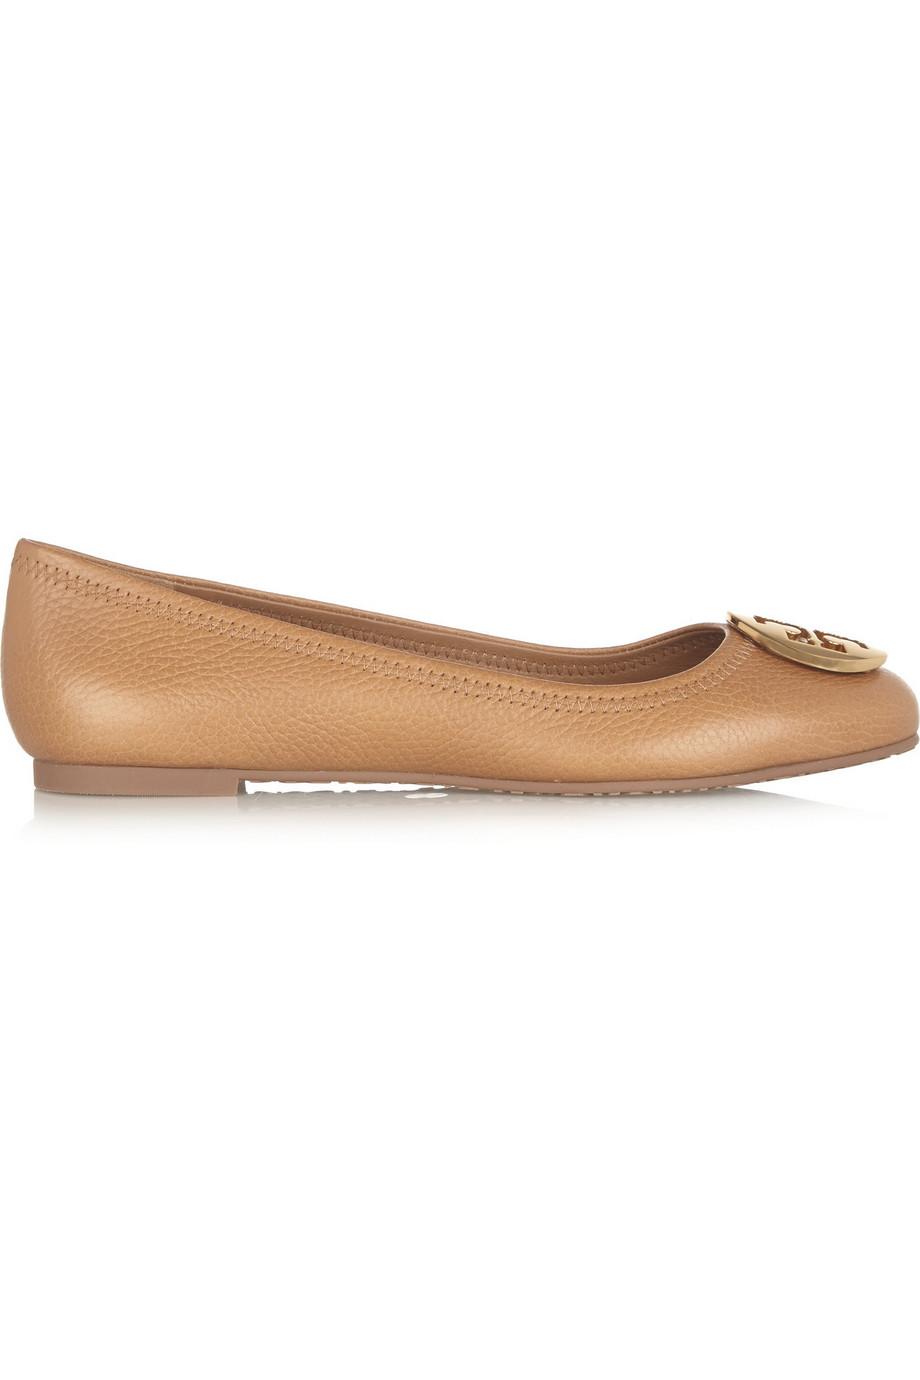 Tory Burch Reva Leather Ballet Flats, Tan, Women's, Size: 11